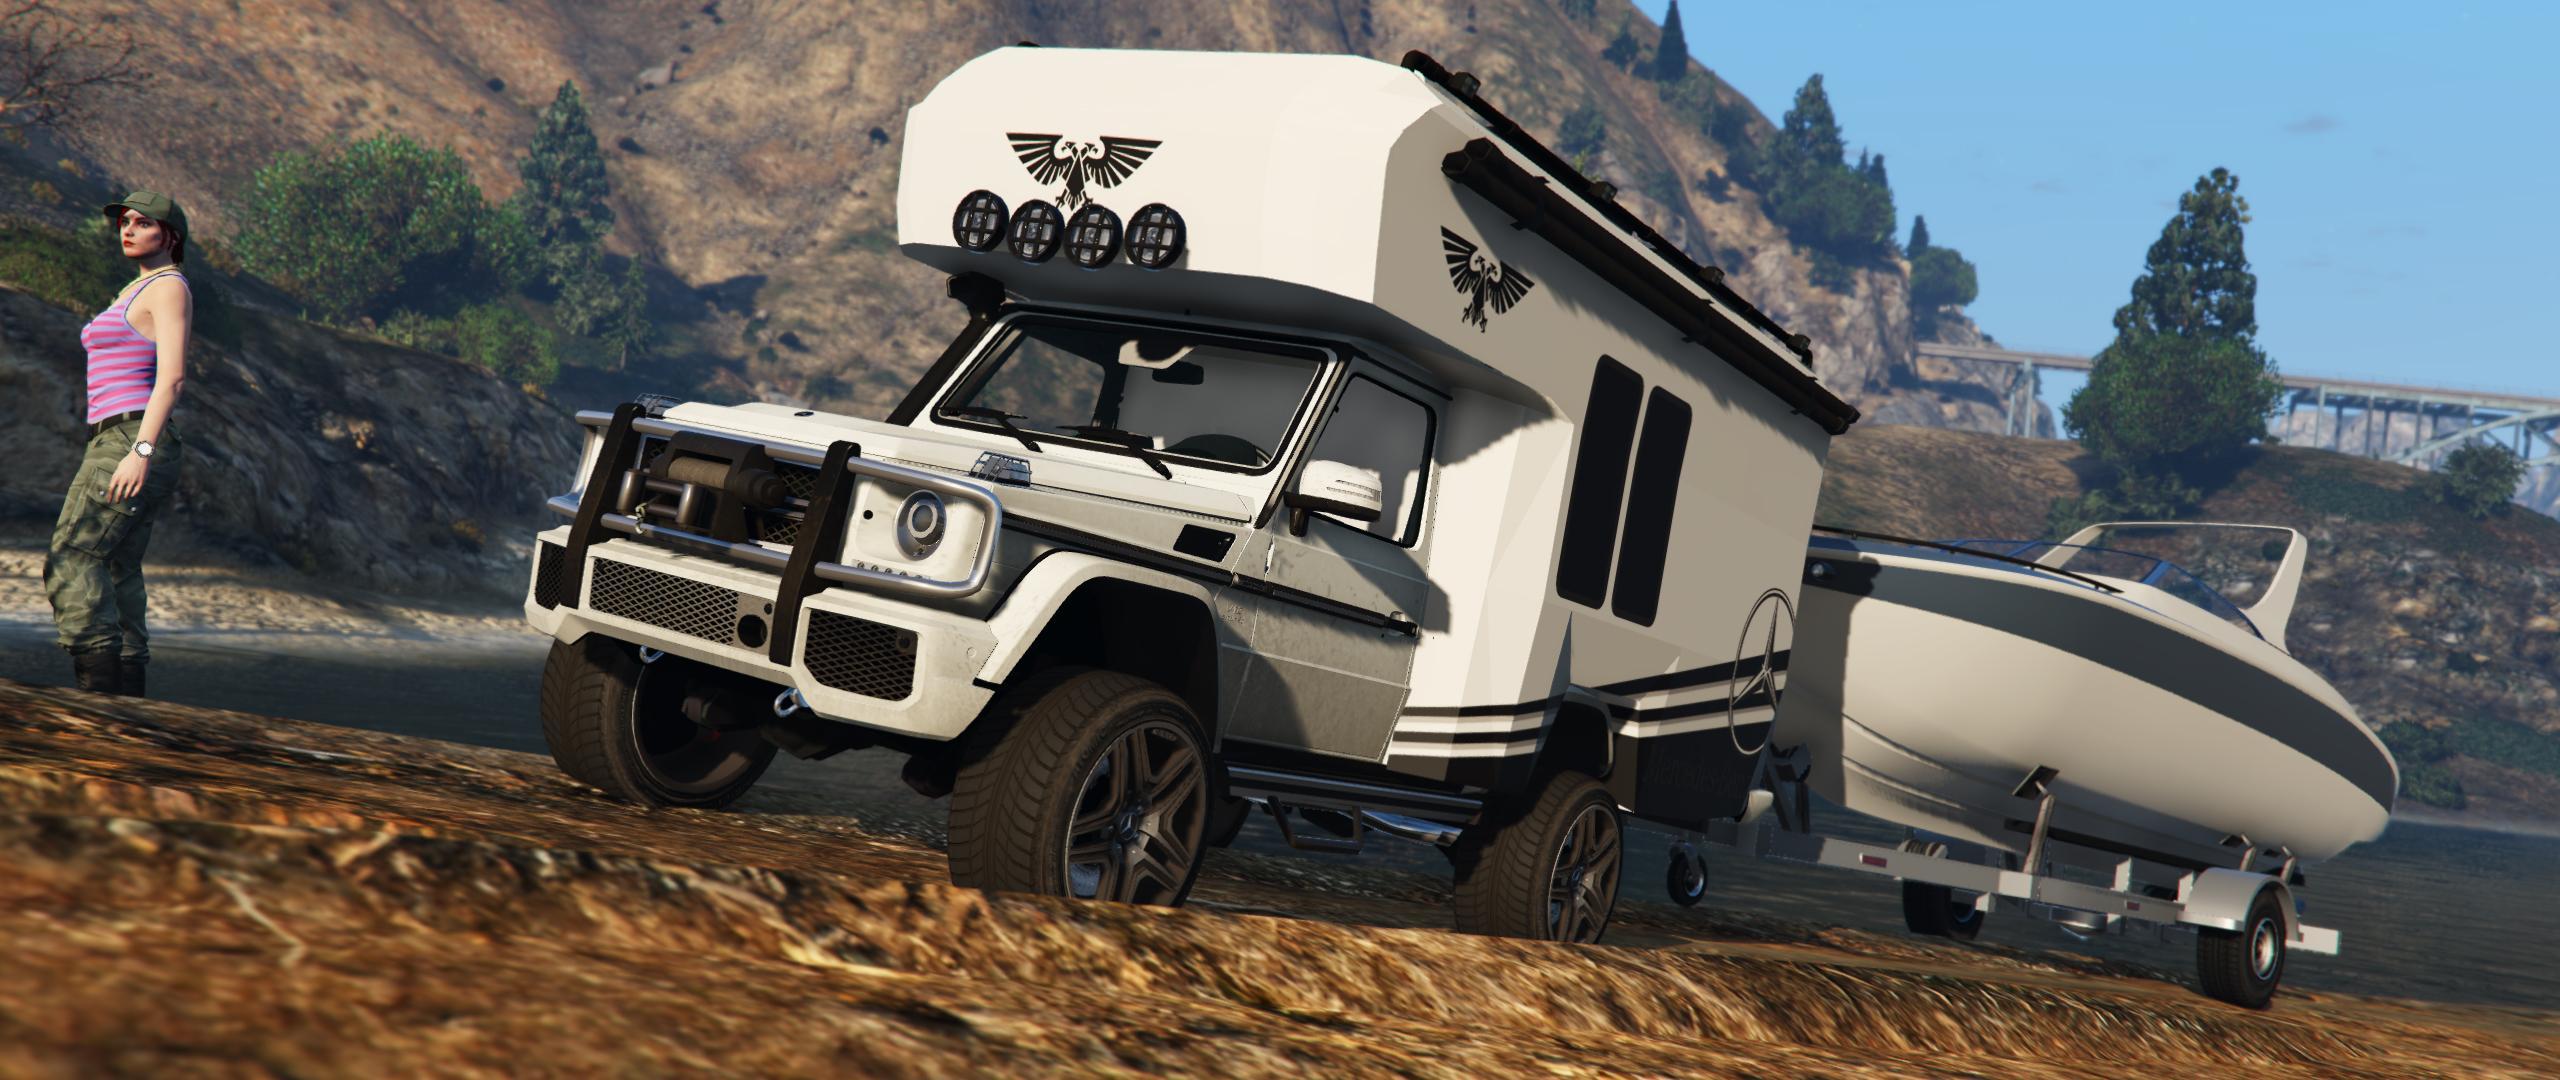 mercedes benz g wagon camper gta5. Black Bedroom Furniture Sets. Home Design Ideas